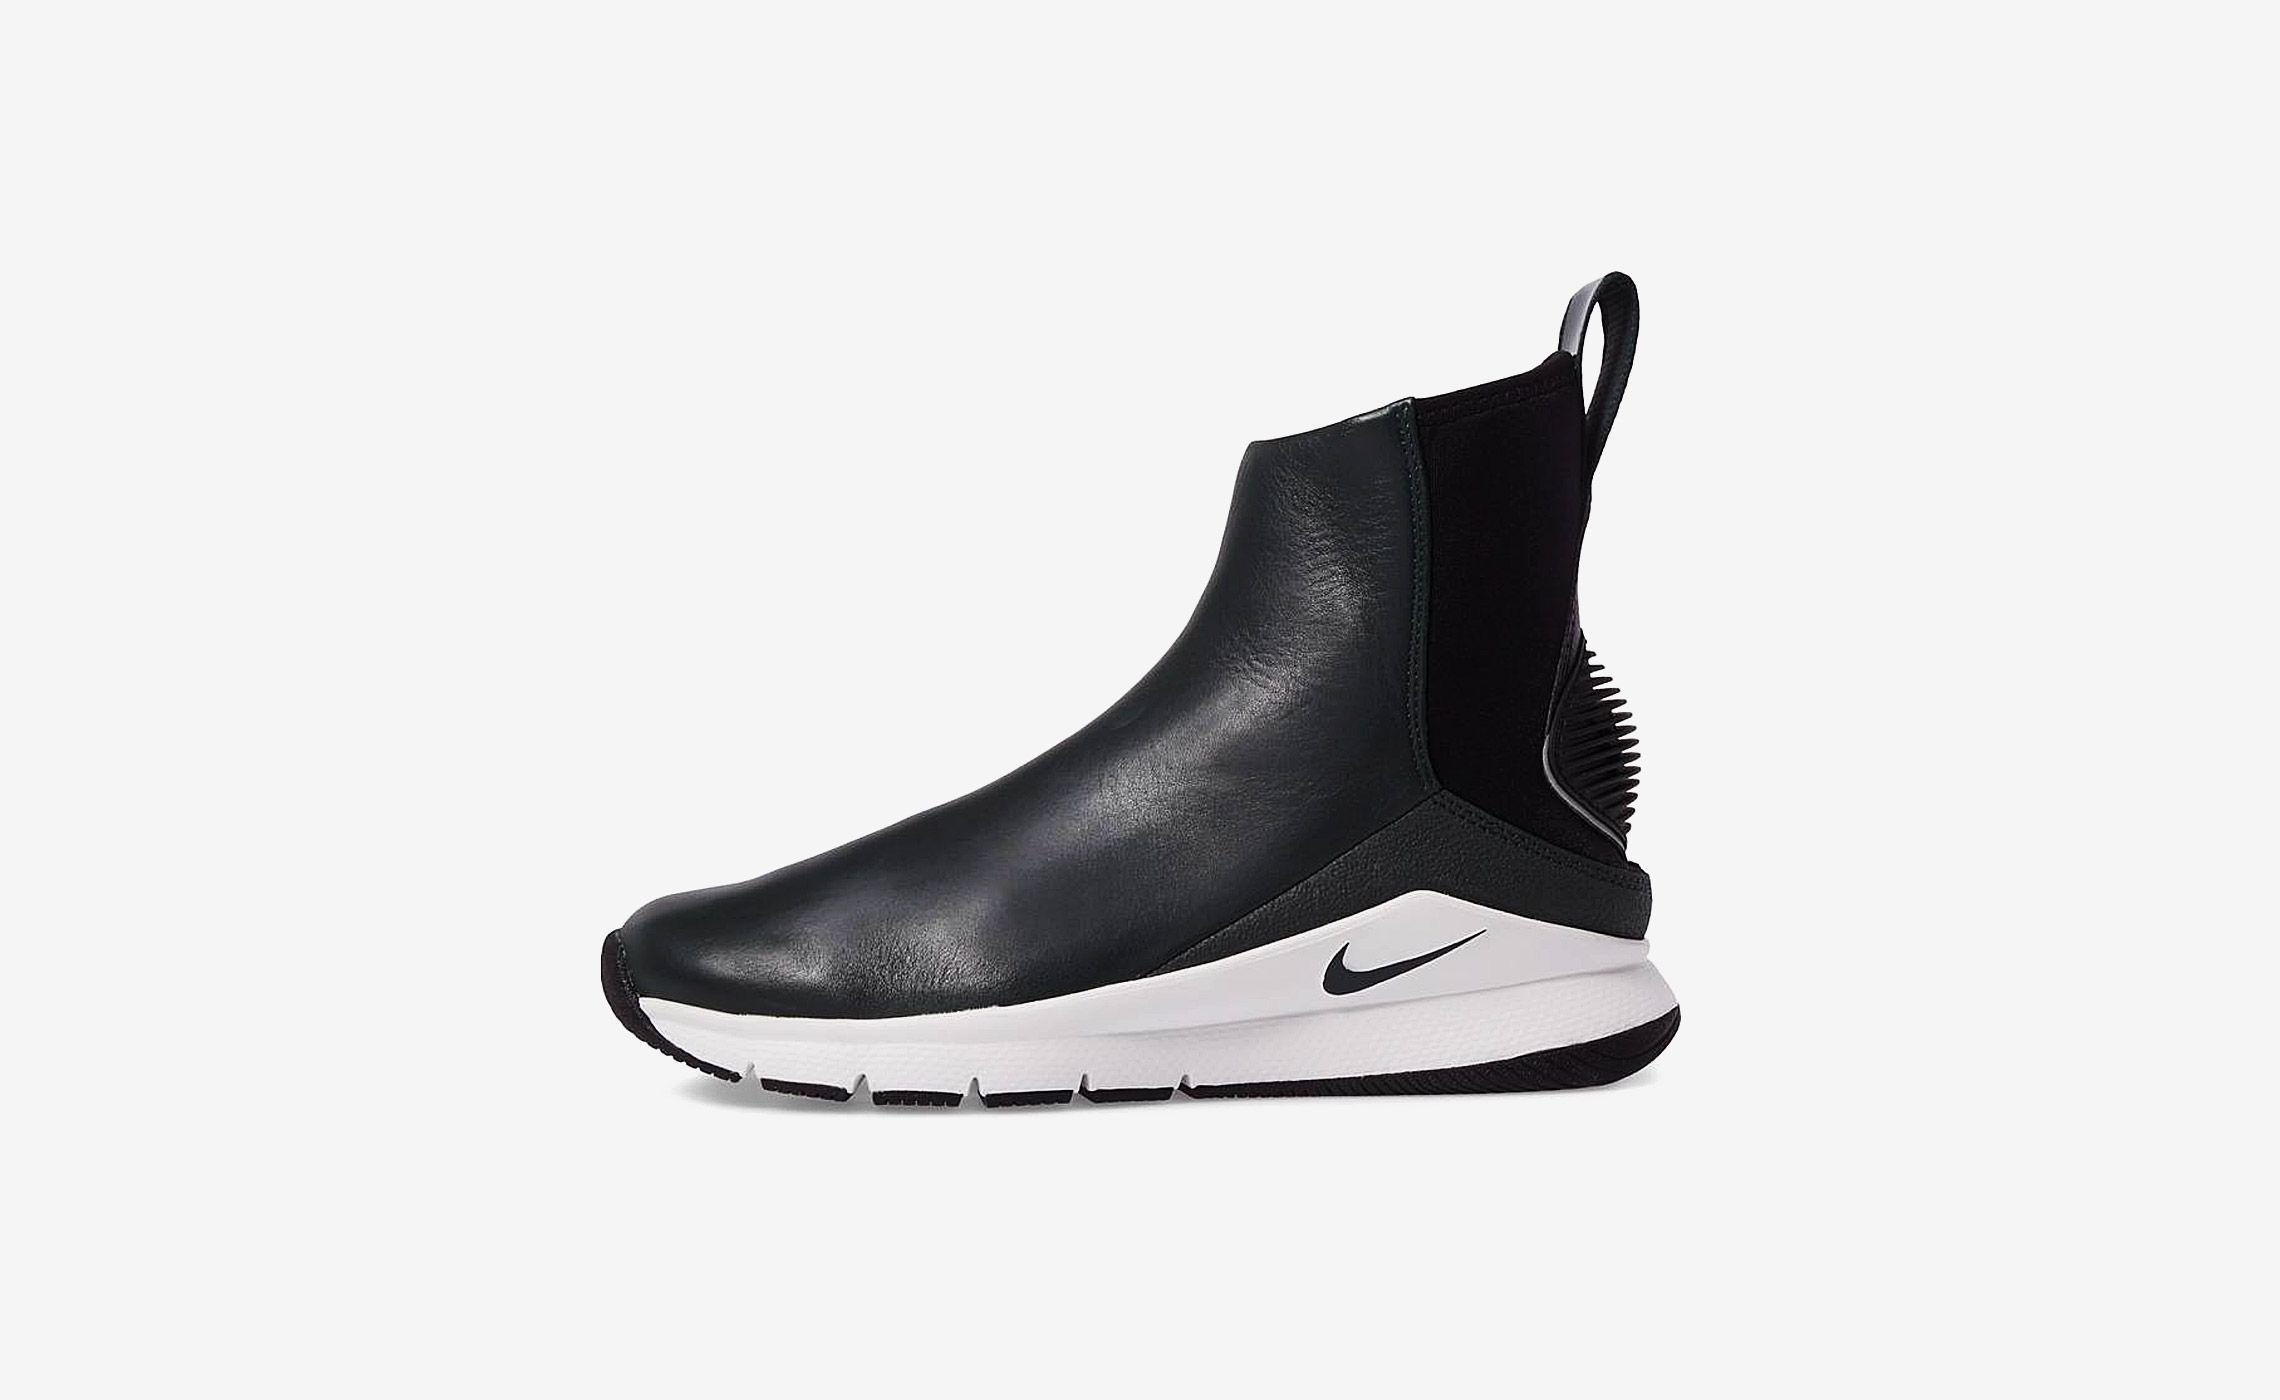 Women's Nike Rivah High Premium Waterproof Sneaker Boot It's ...